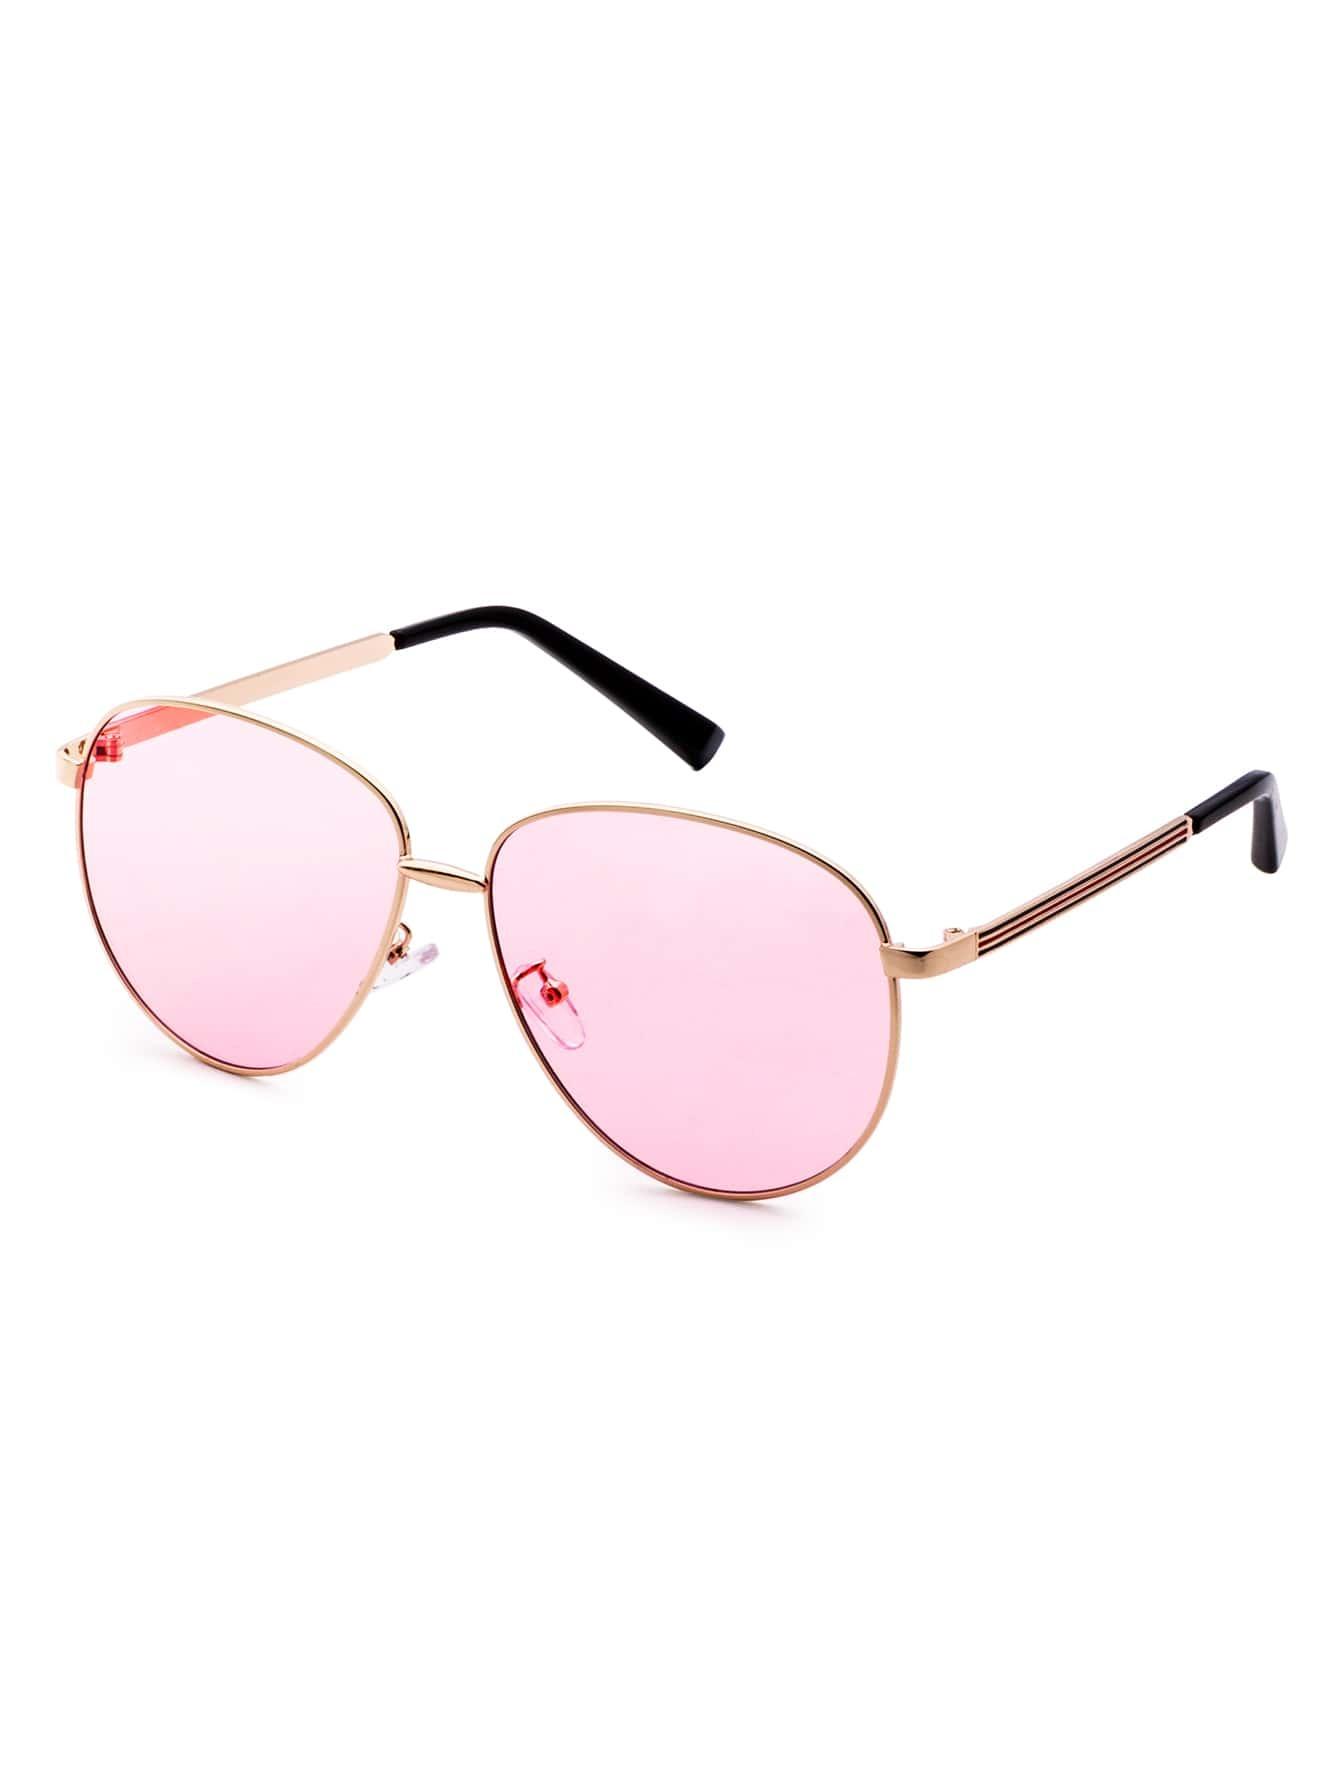 lunettes de soleil r tro verre rose monture en m tal. Black Bedroom Furniture Sets. Home Design Ideas